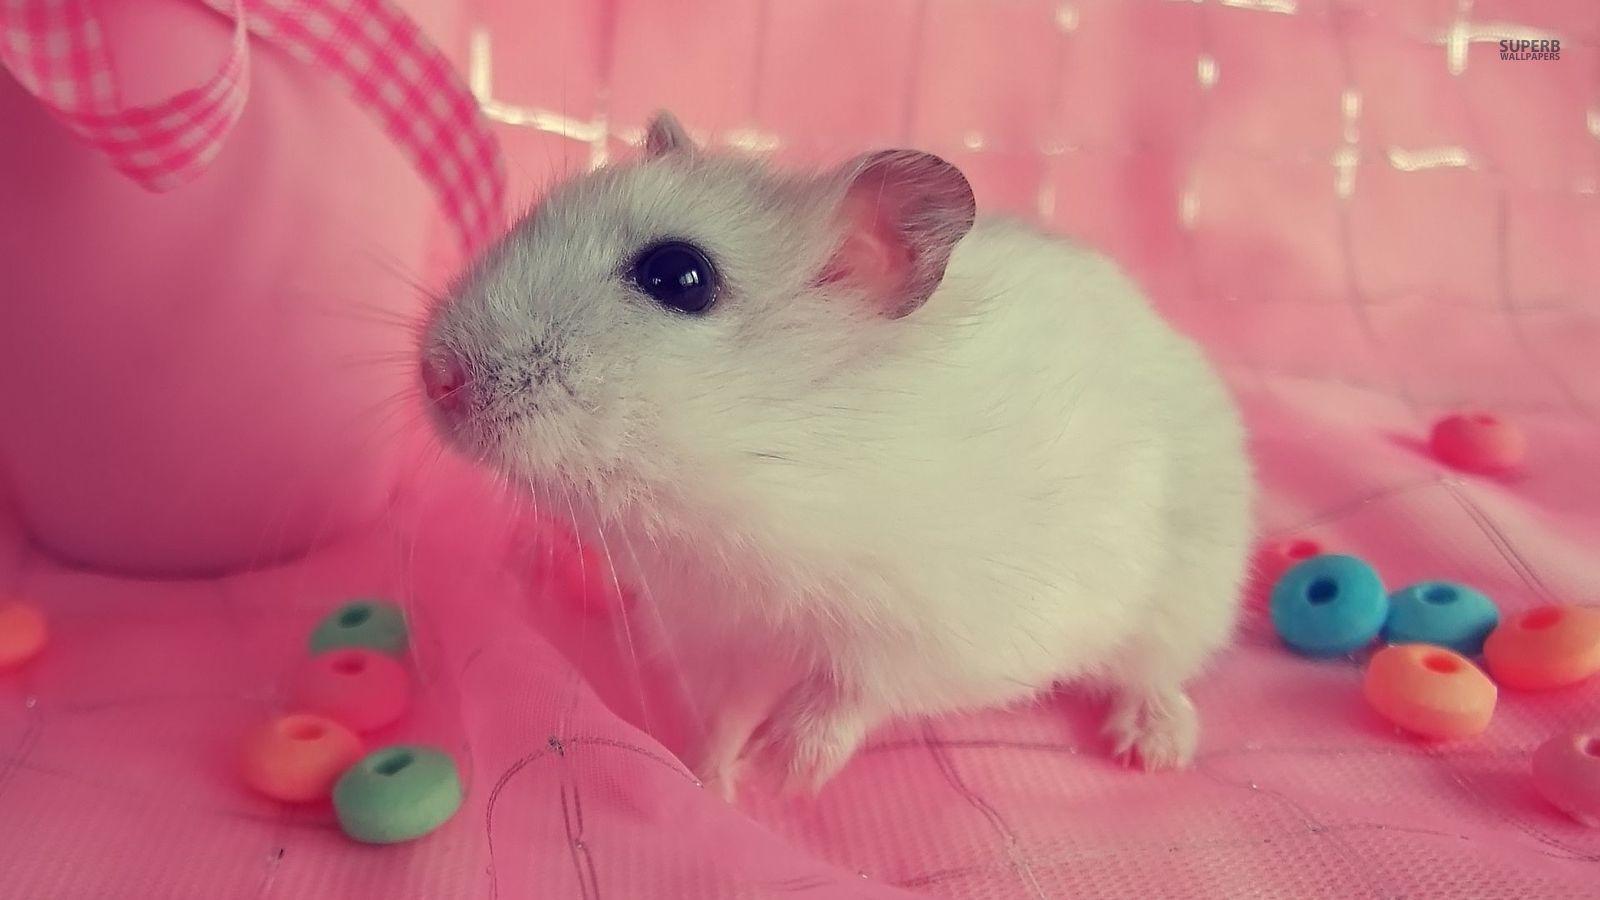 Hamster - Animals Wallpaper (38674645) - Fanpop